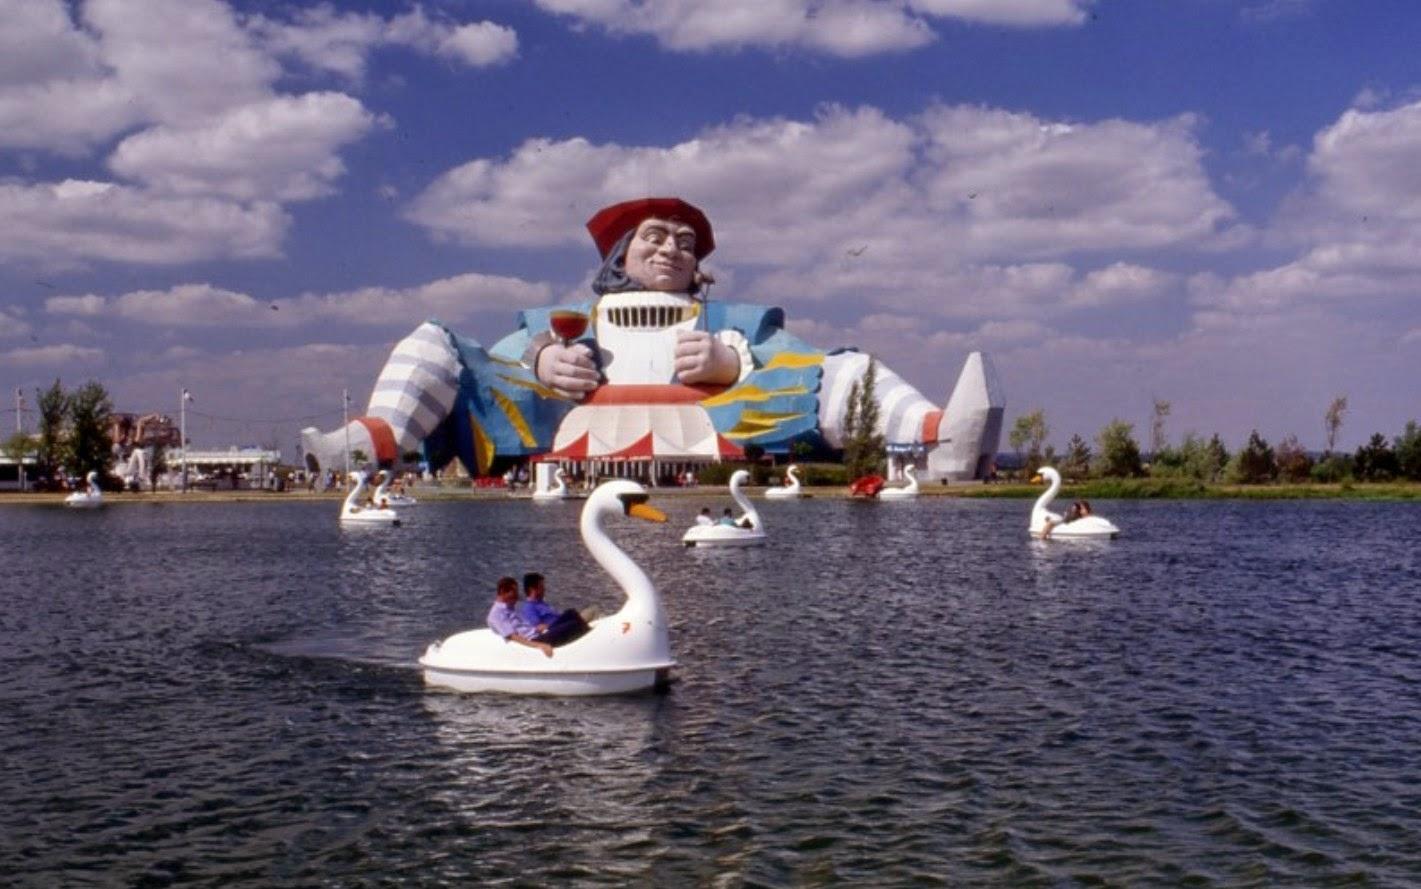 parc attraction gargantua